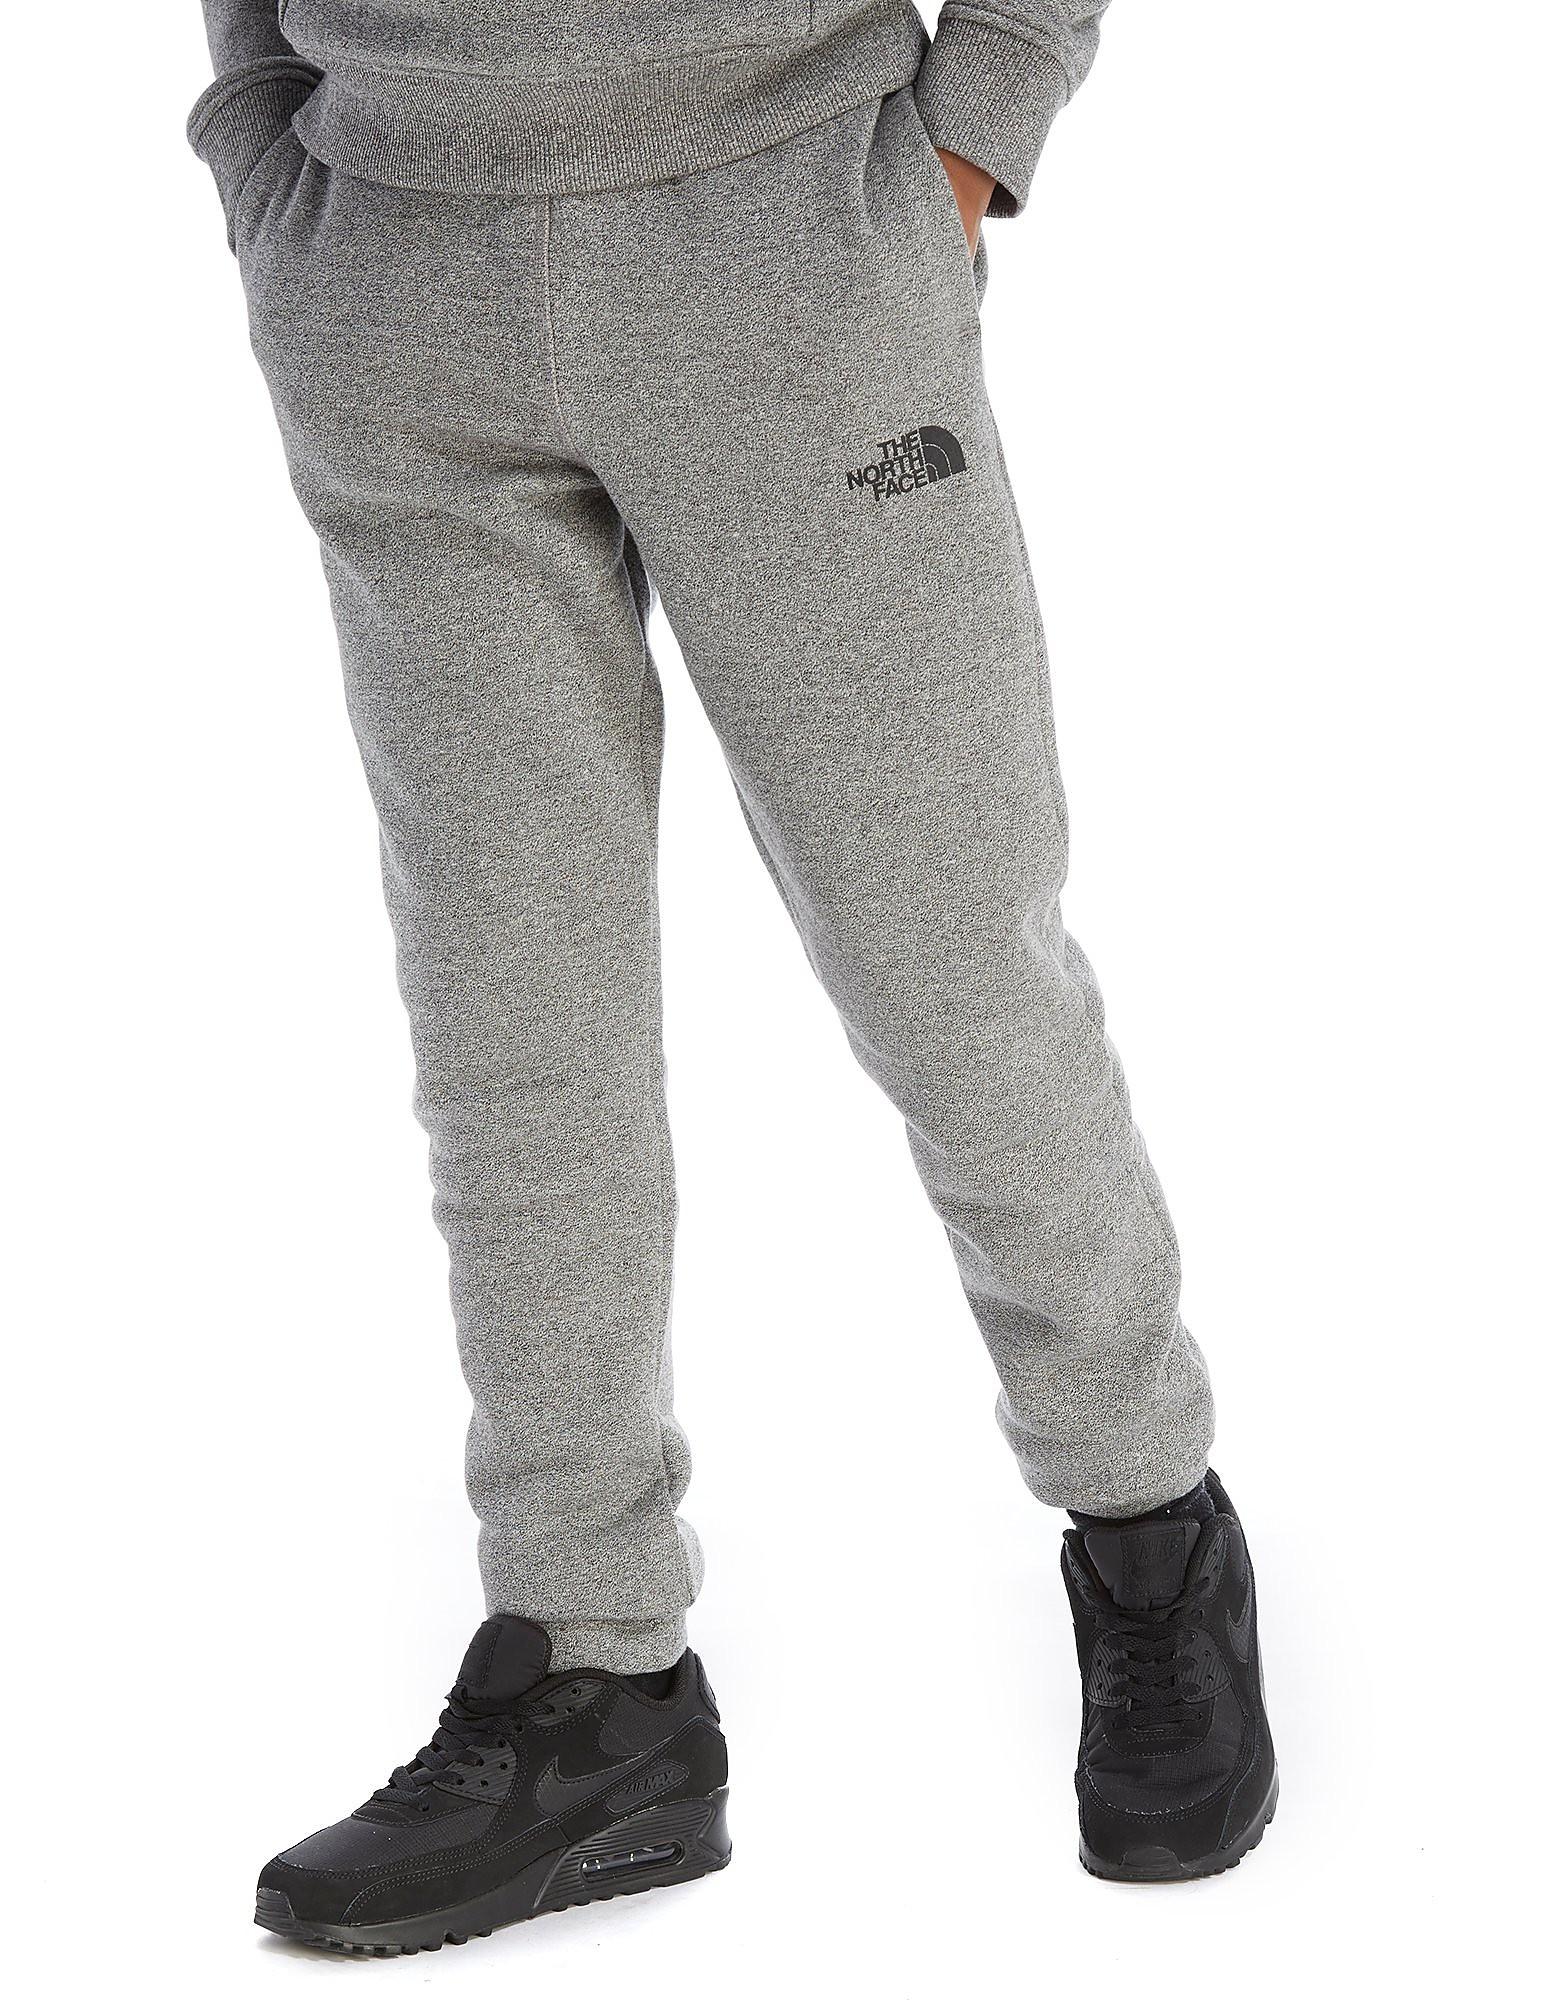 The North Face Pantalon de survêtement Drew Junior - Only at JD - Grey/Black, Grey/Black